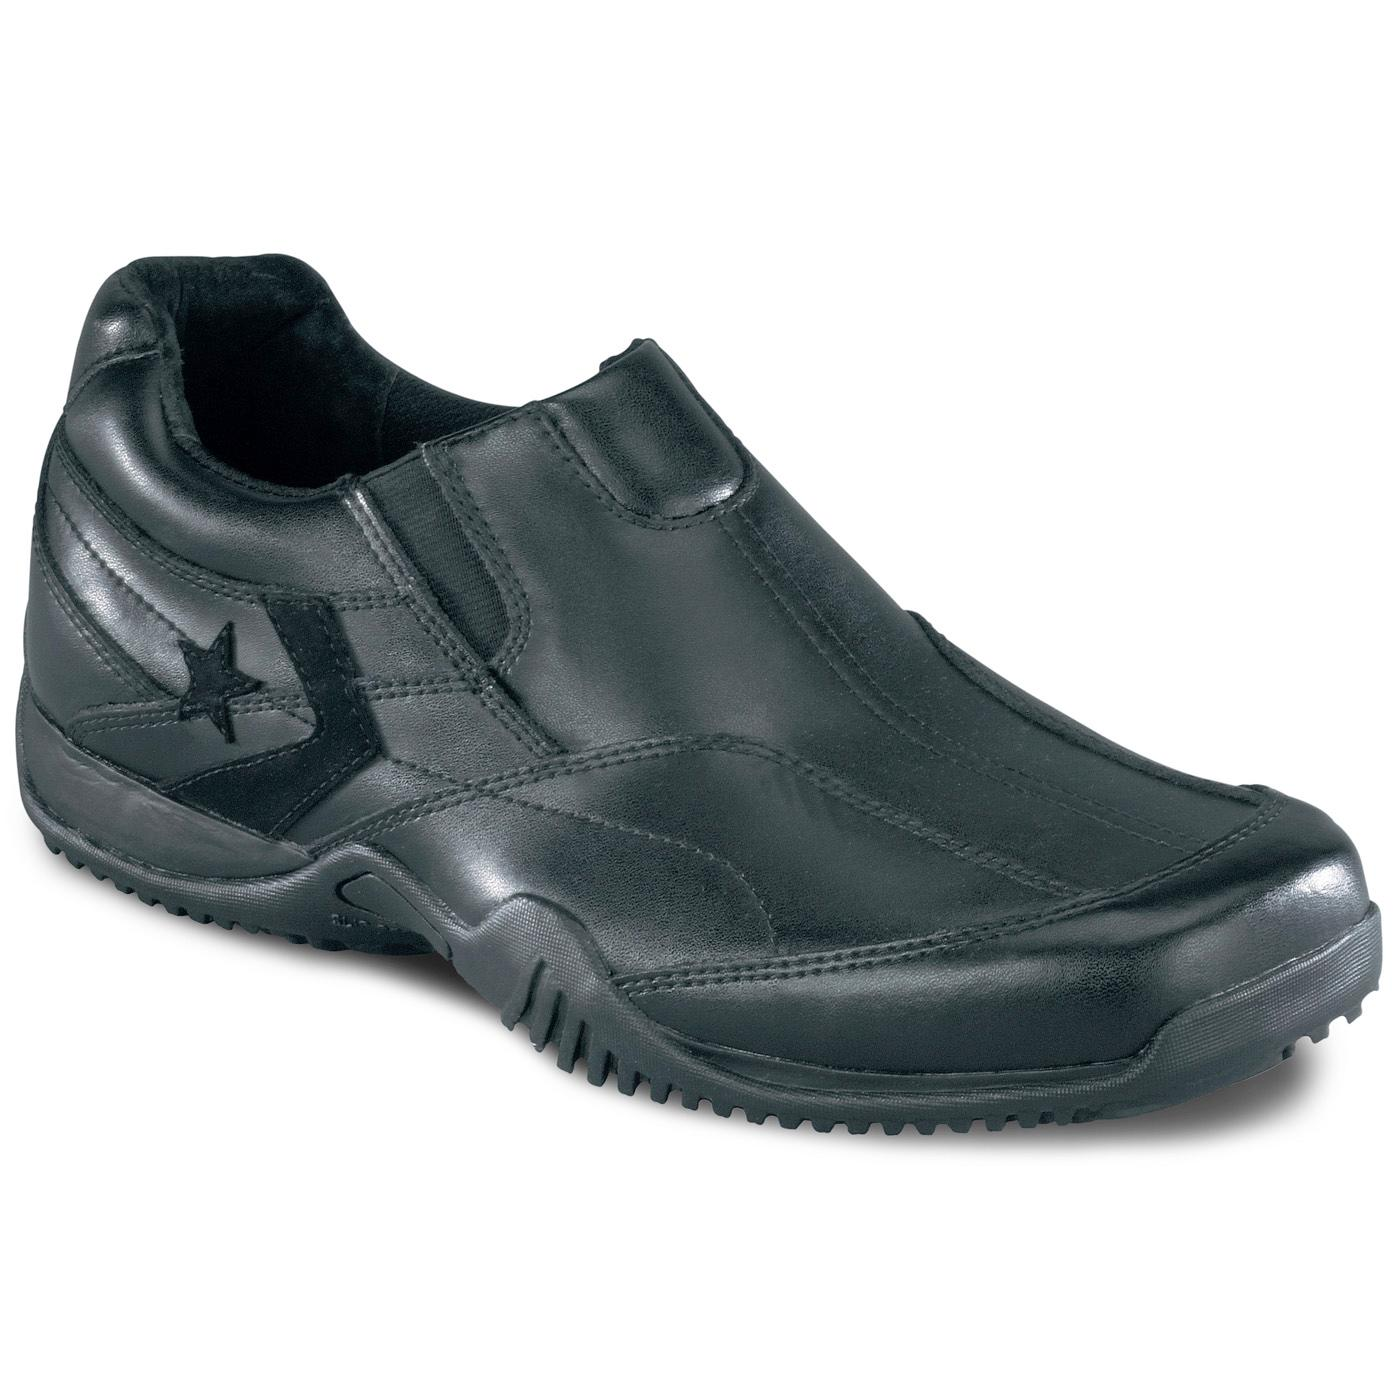 c9c11f9de7836d Converse slip resistant slip on work shoesconverse slip resistant slip on work  shoes jpg 1400x1400 Converse